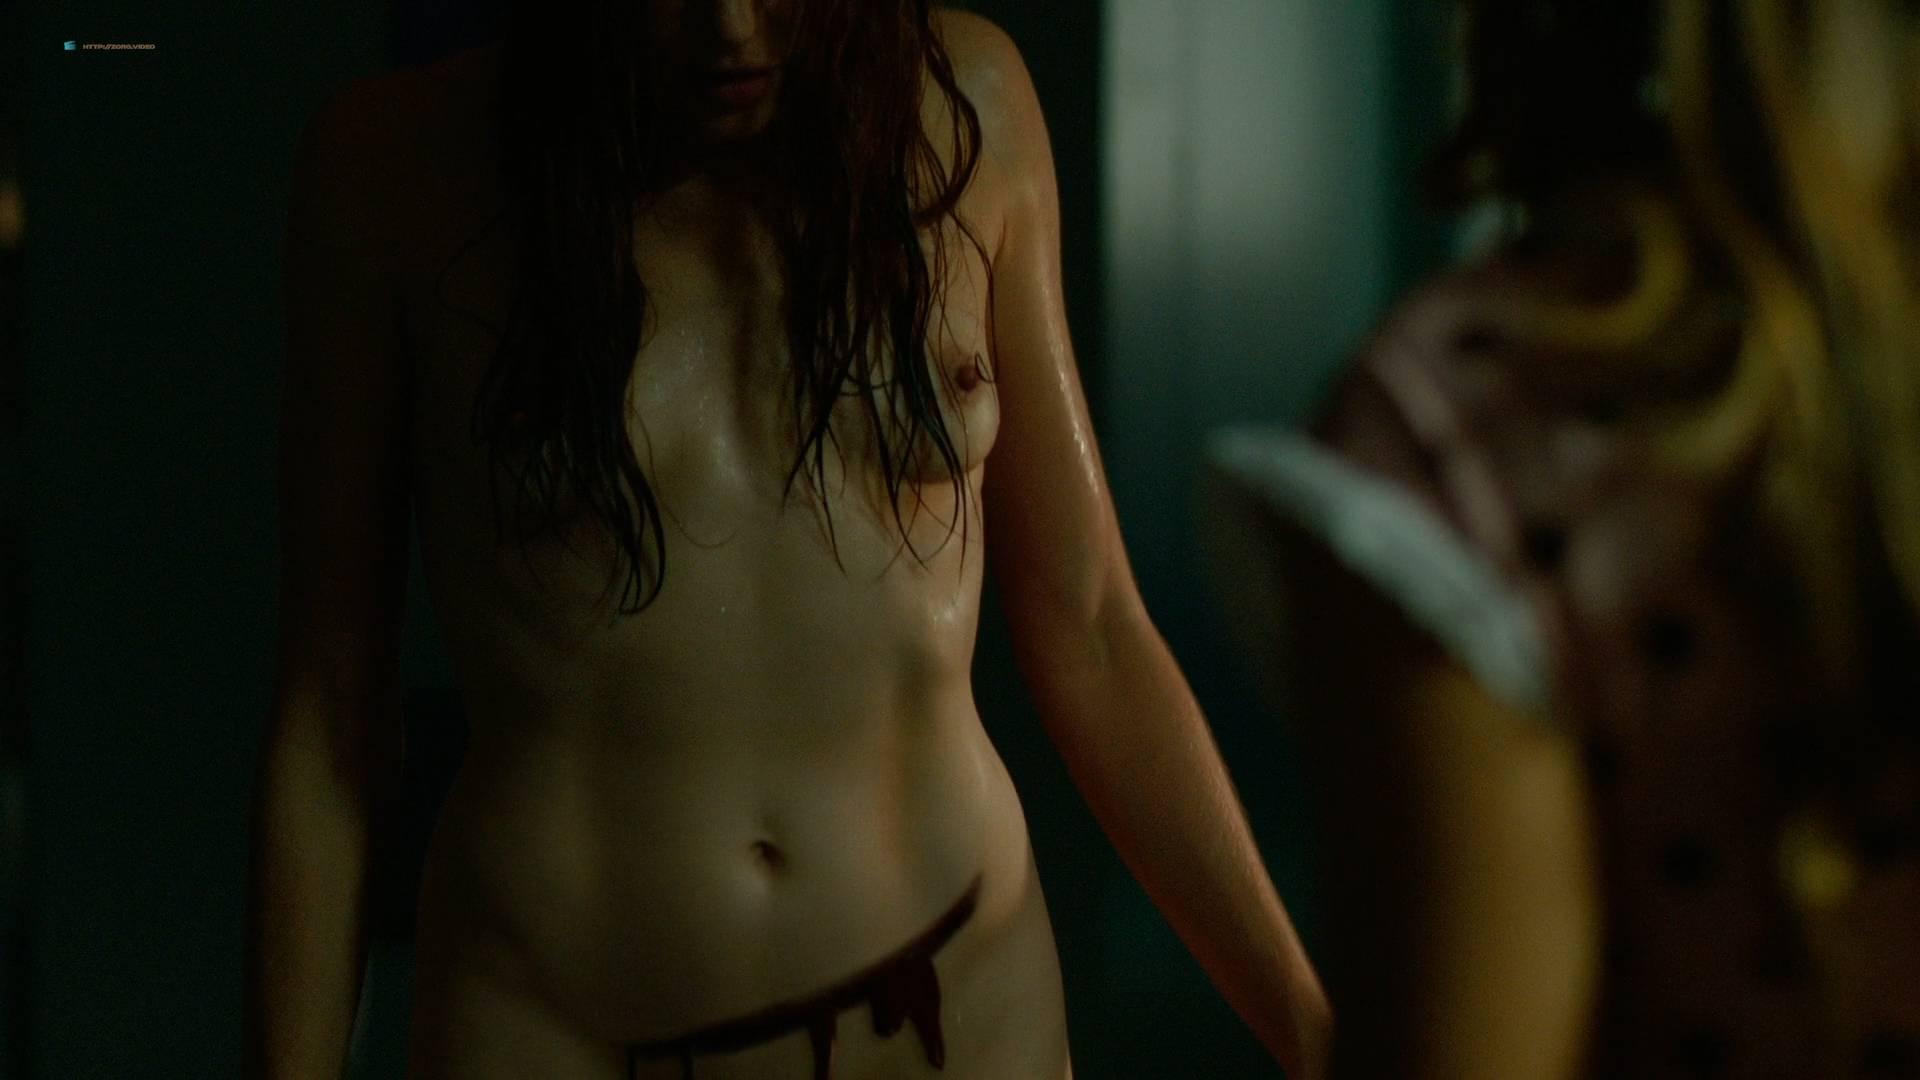 Nicole LaLiberte nude full frontal - Girls Against Boys (2013) HD 1080p BluRay (5)